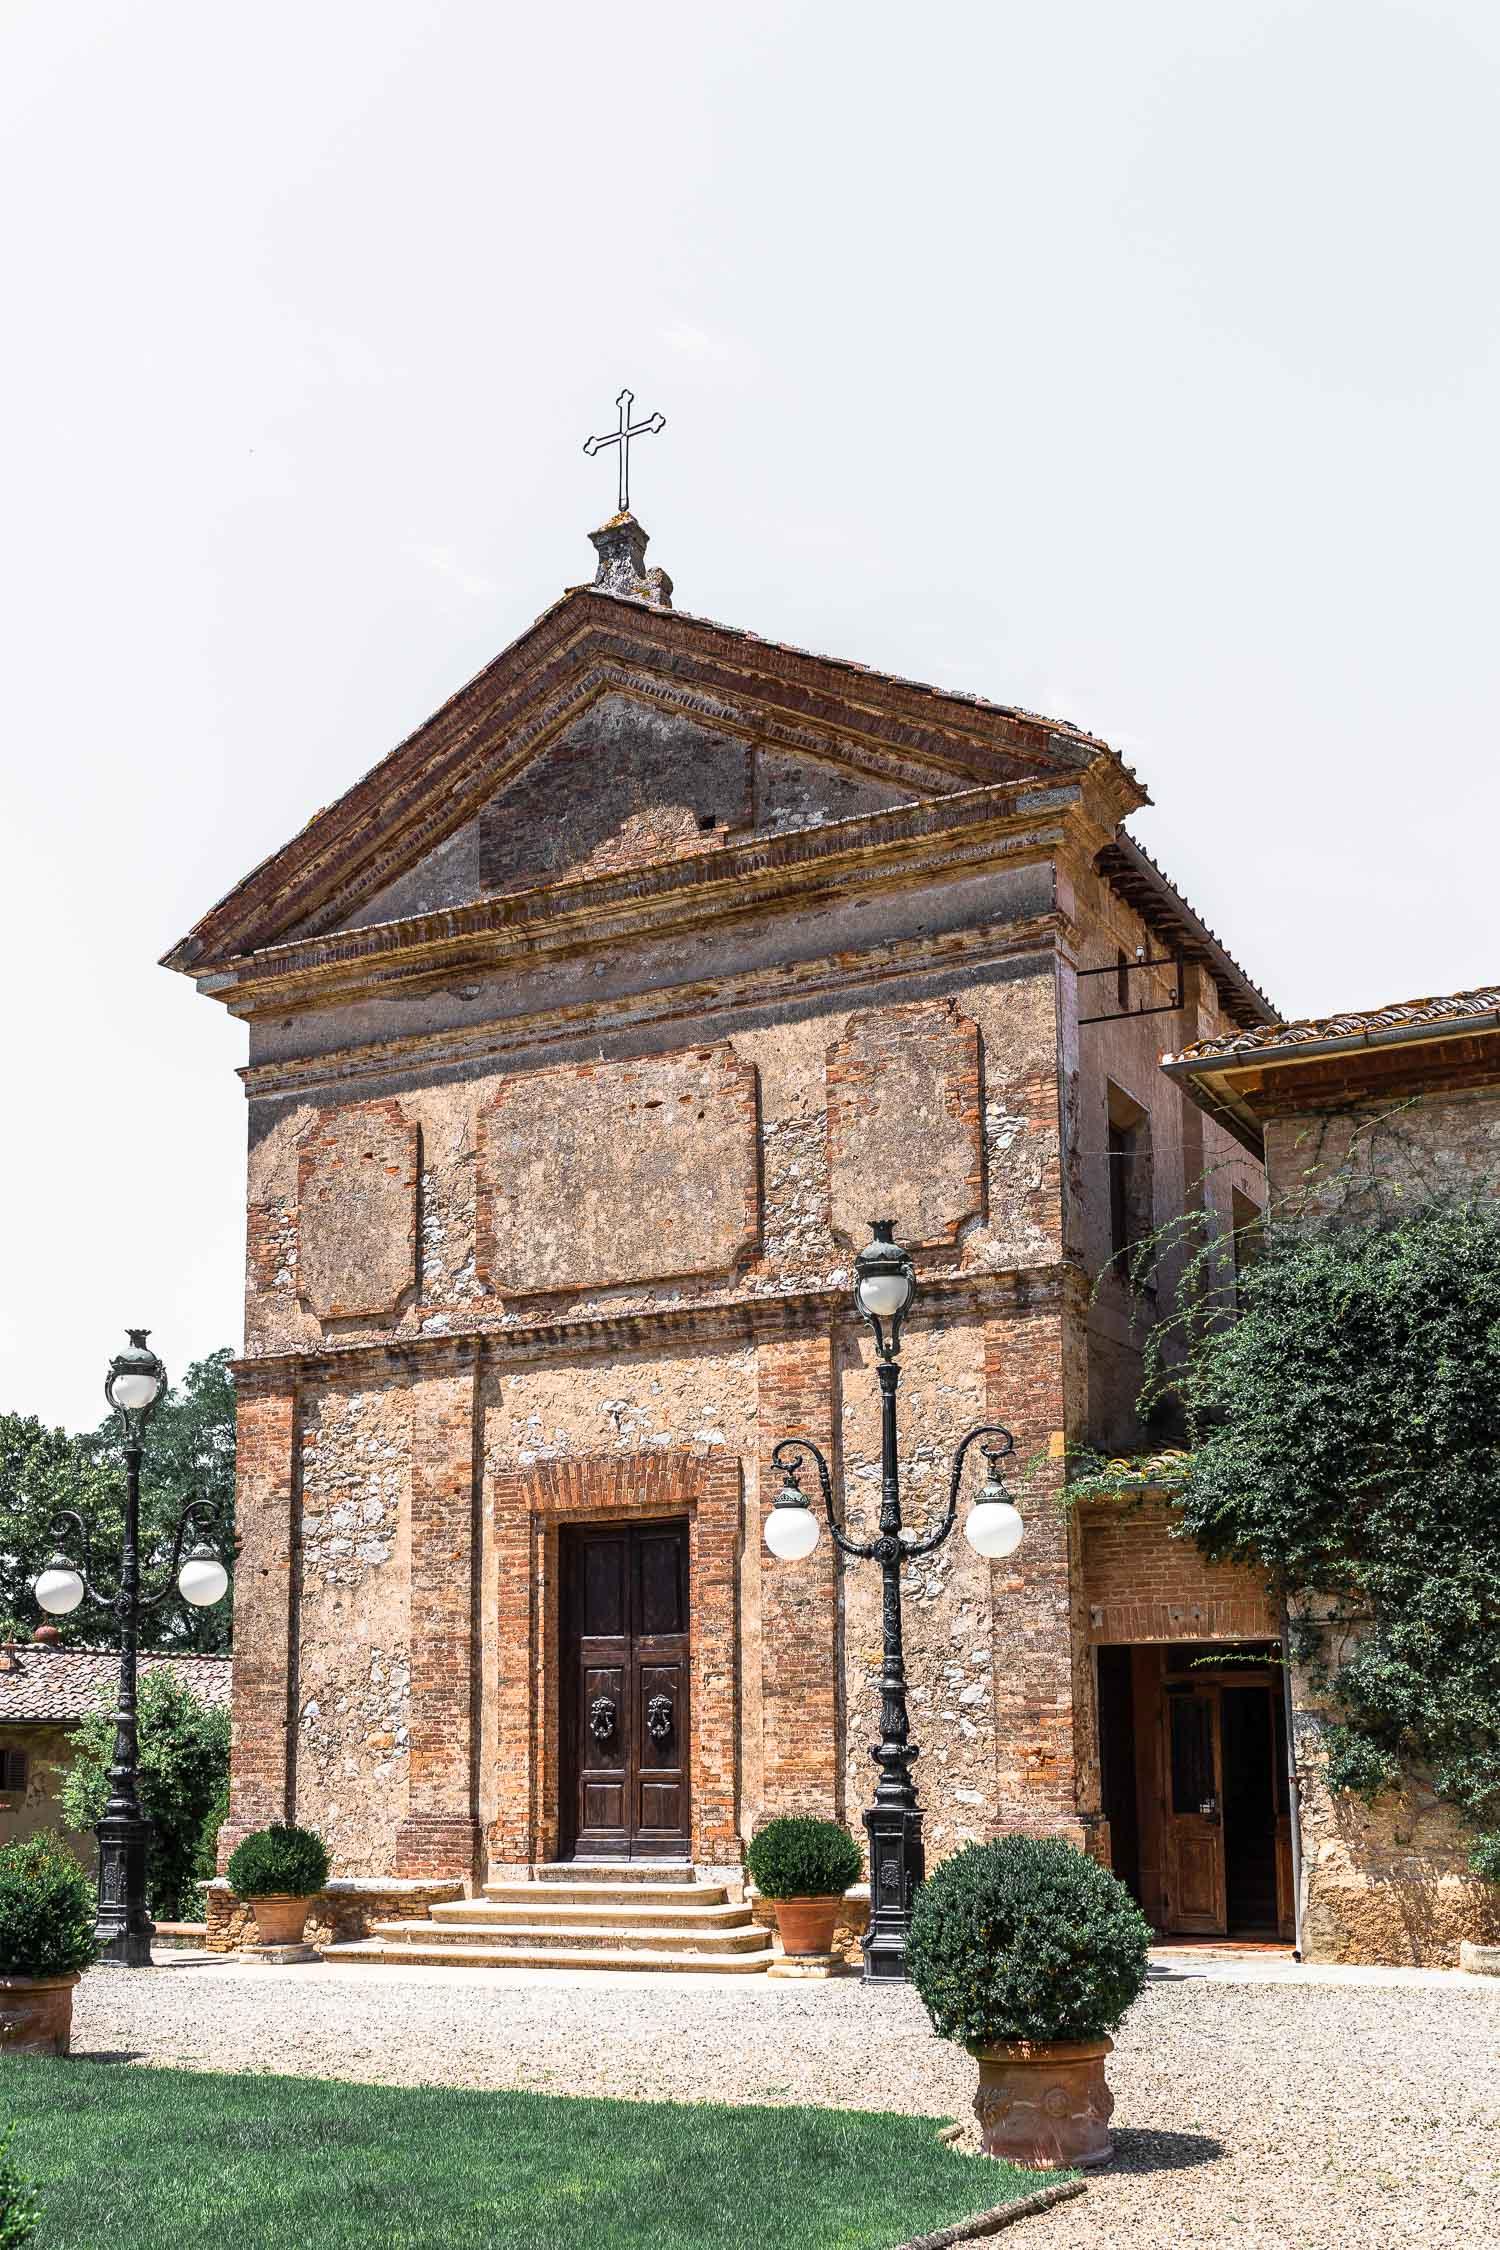 Tuscany-Relais-La-Suvera-Church-4737.jpg